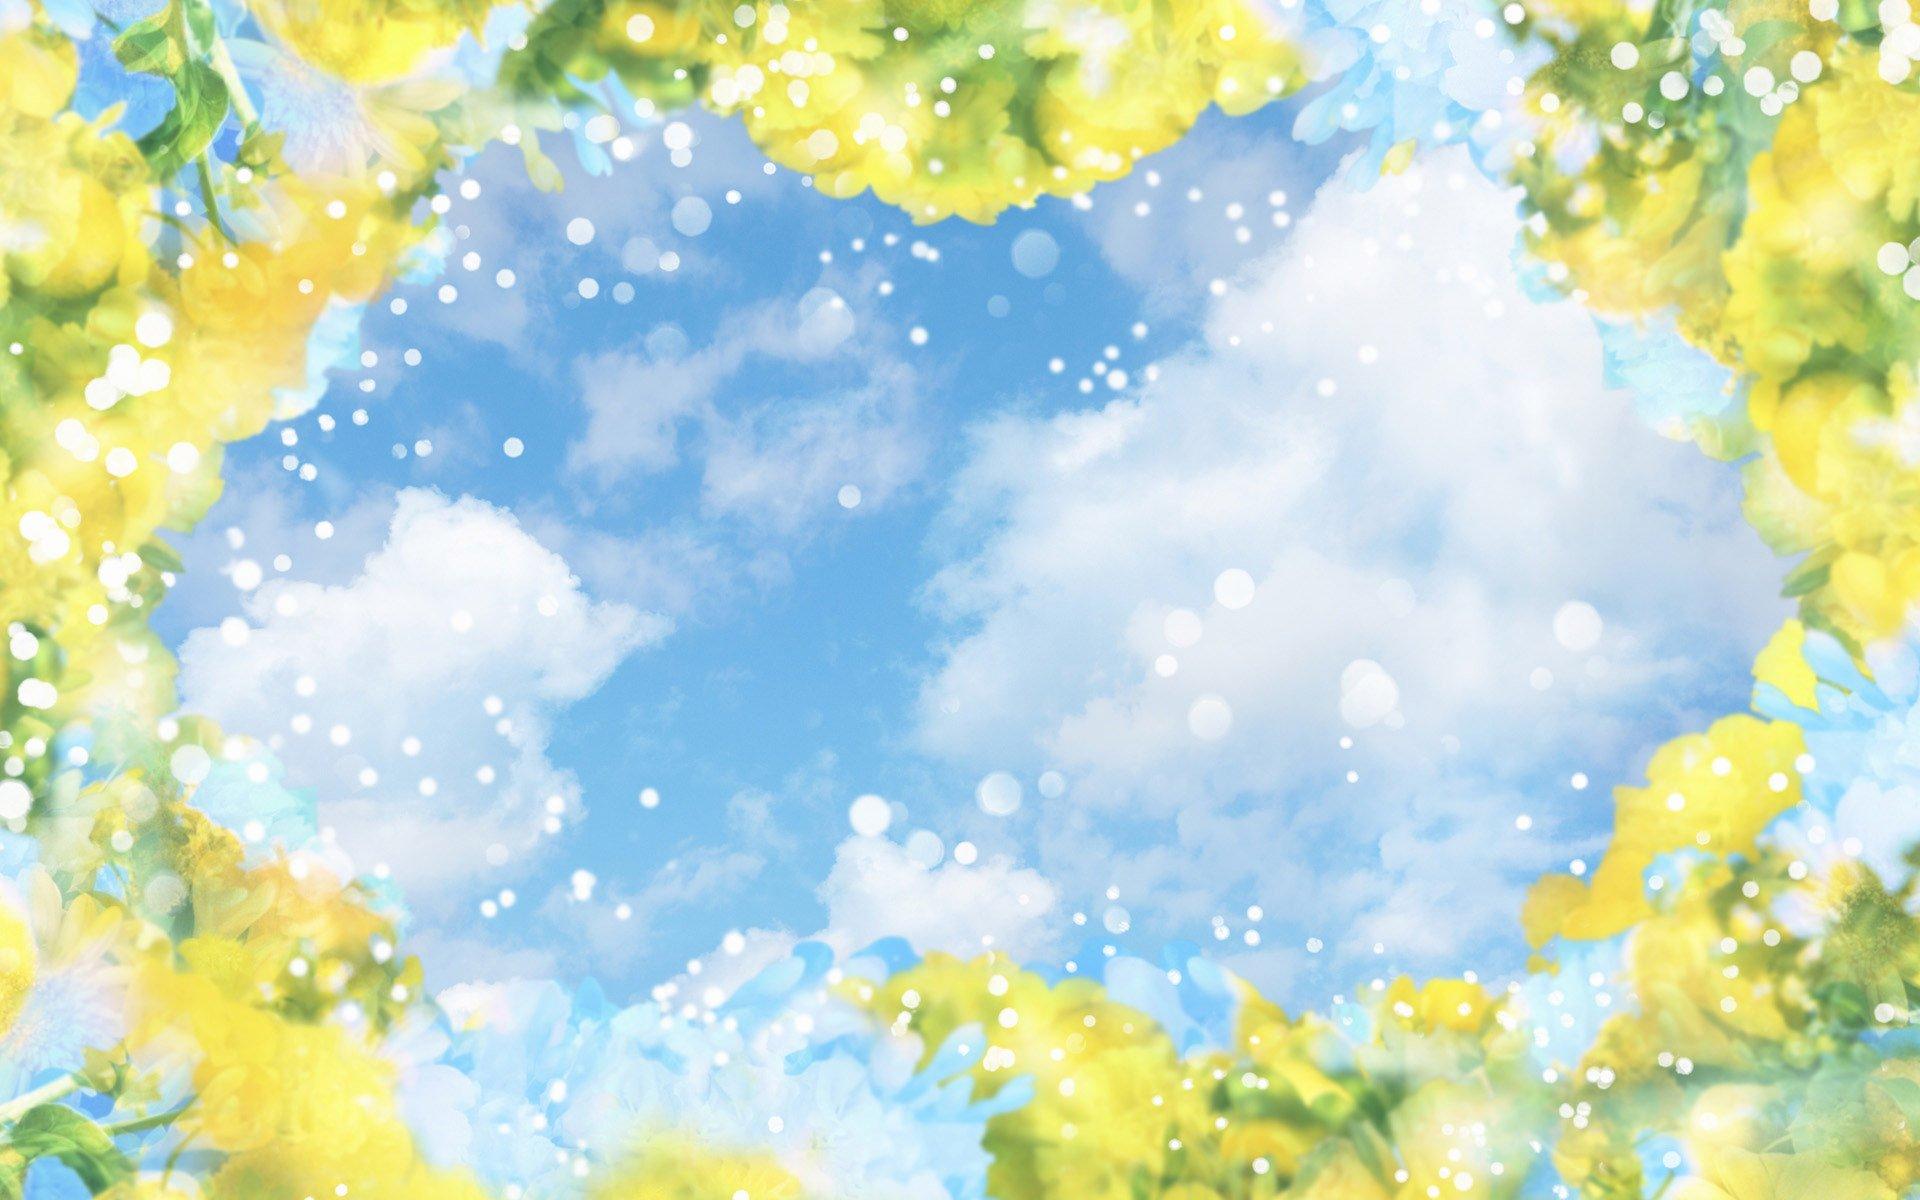 Background wallpaper flowers vector download Flowers Background Wallpaper vector download